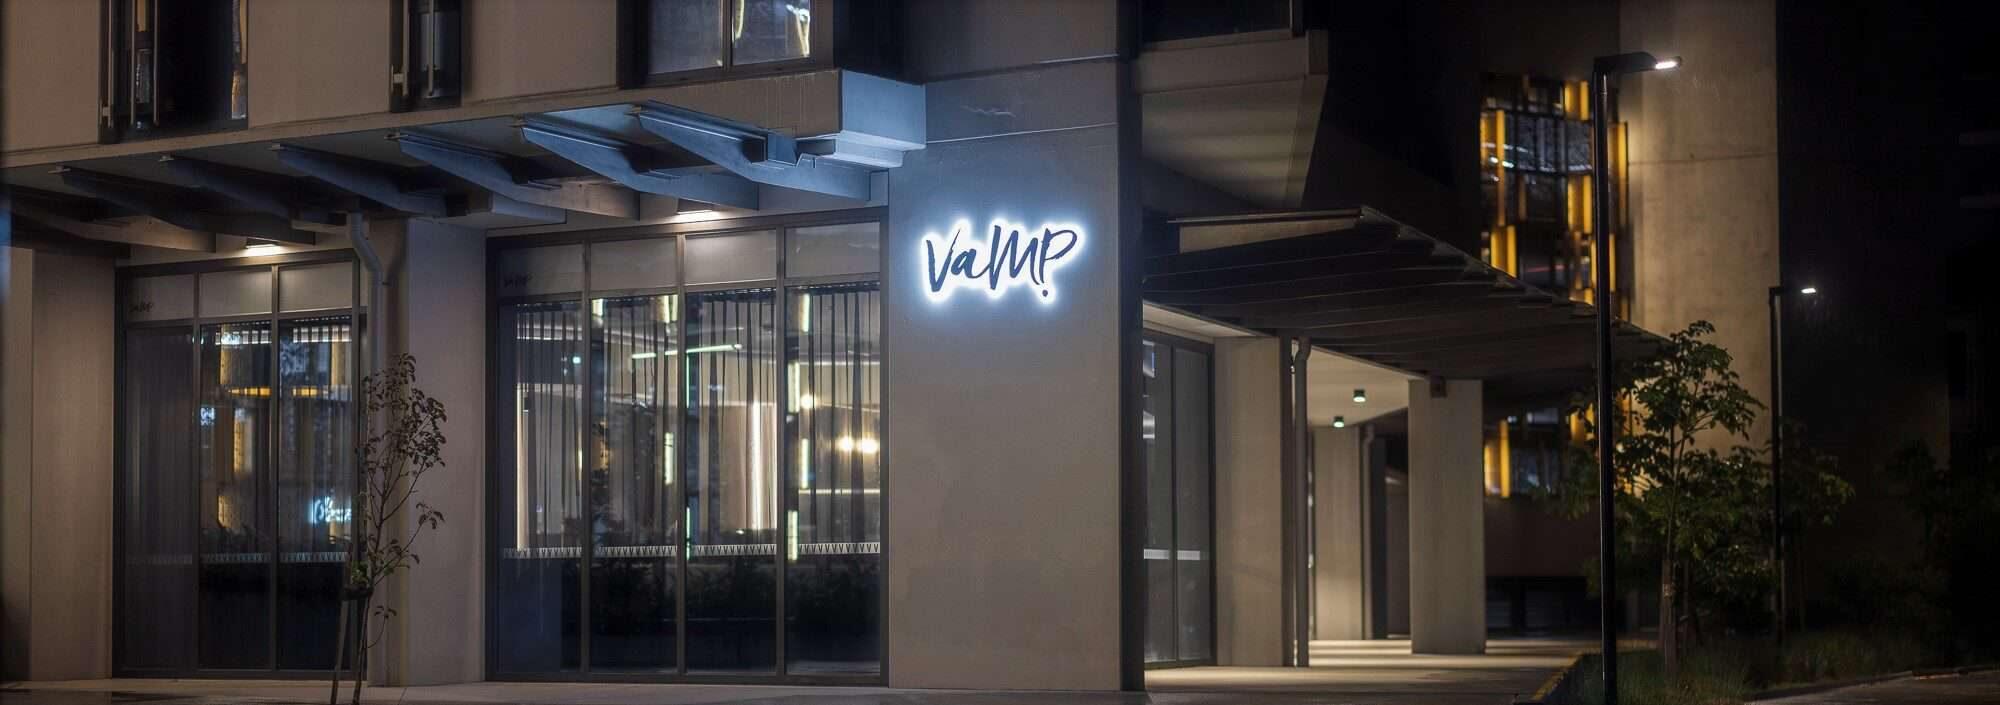 Vamp New Clinic King Street Newcastle NSW